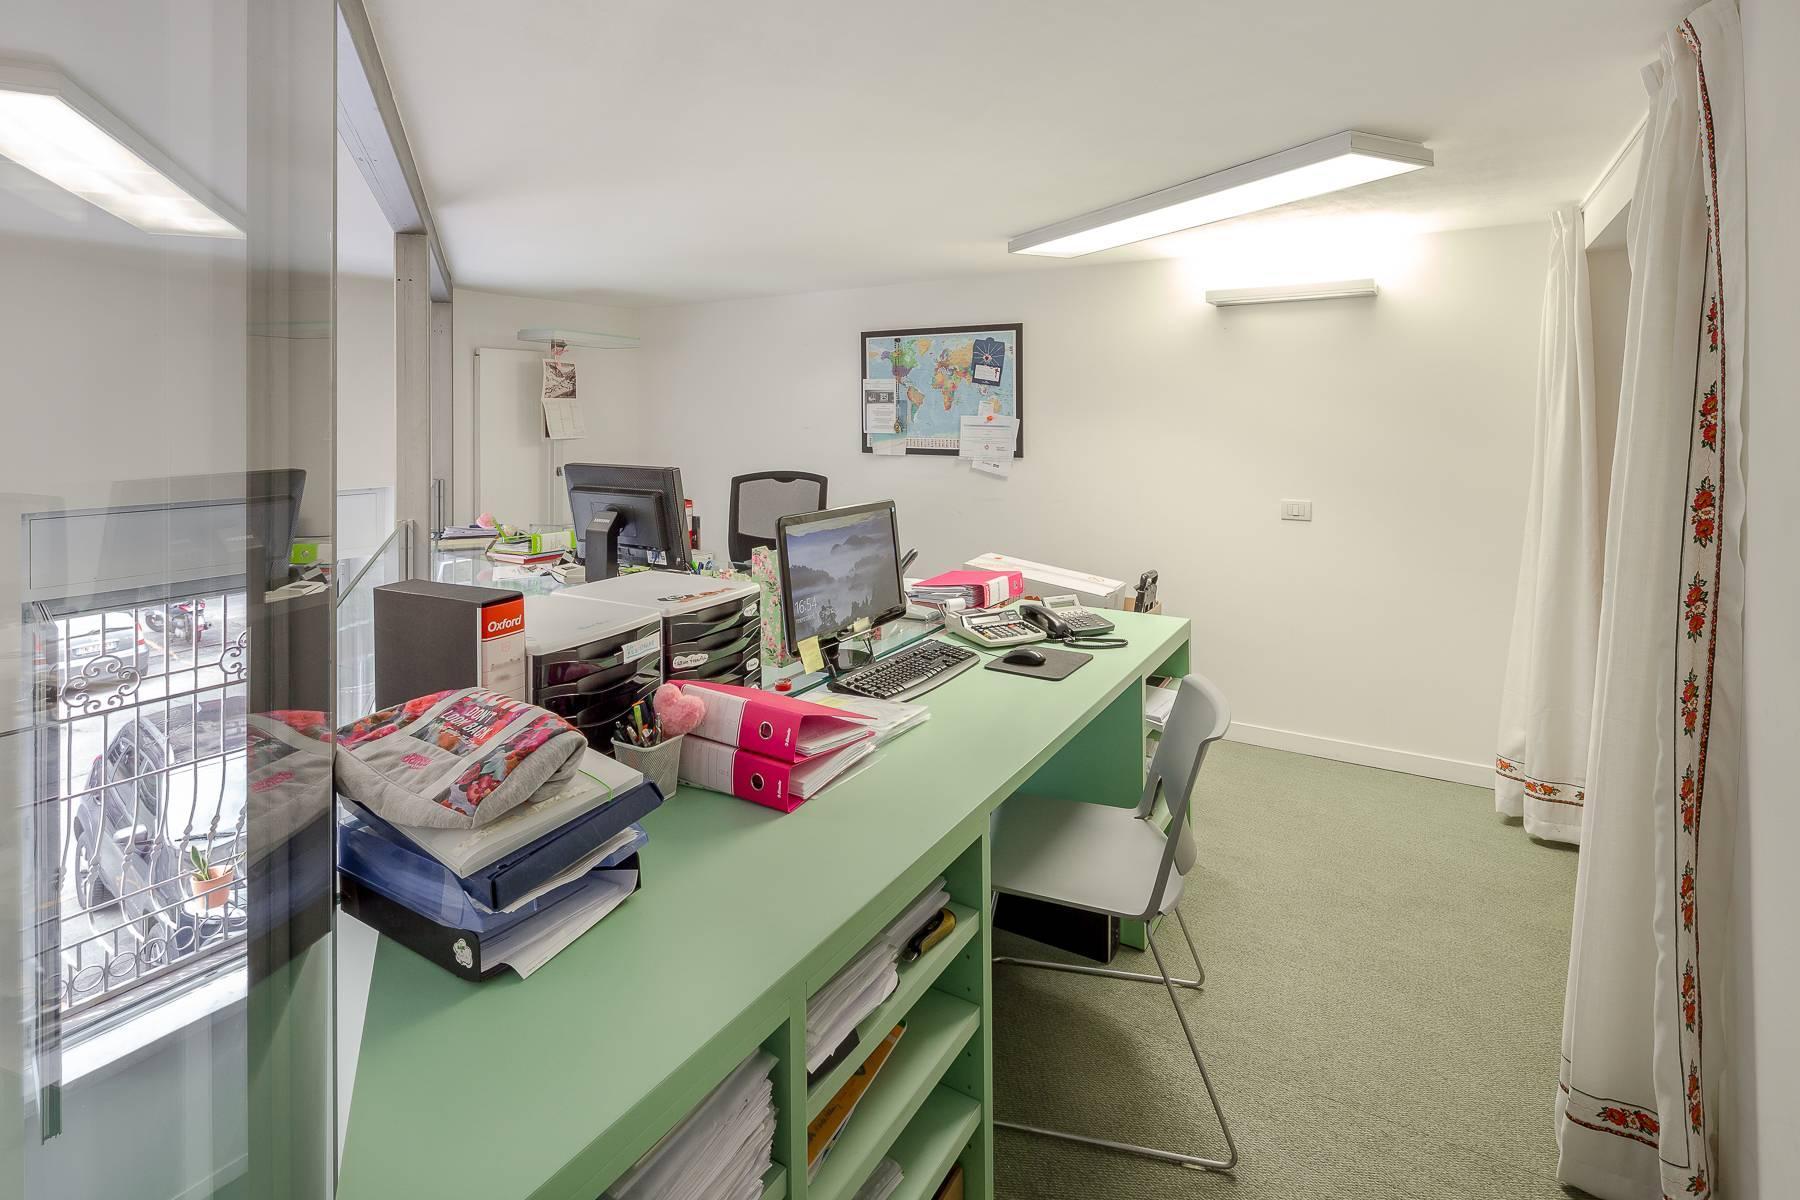 Open space office/residential property in Piazza Giovine Italia/Via Aurelio Saffi - 7